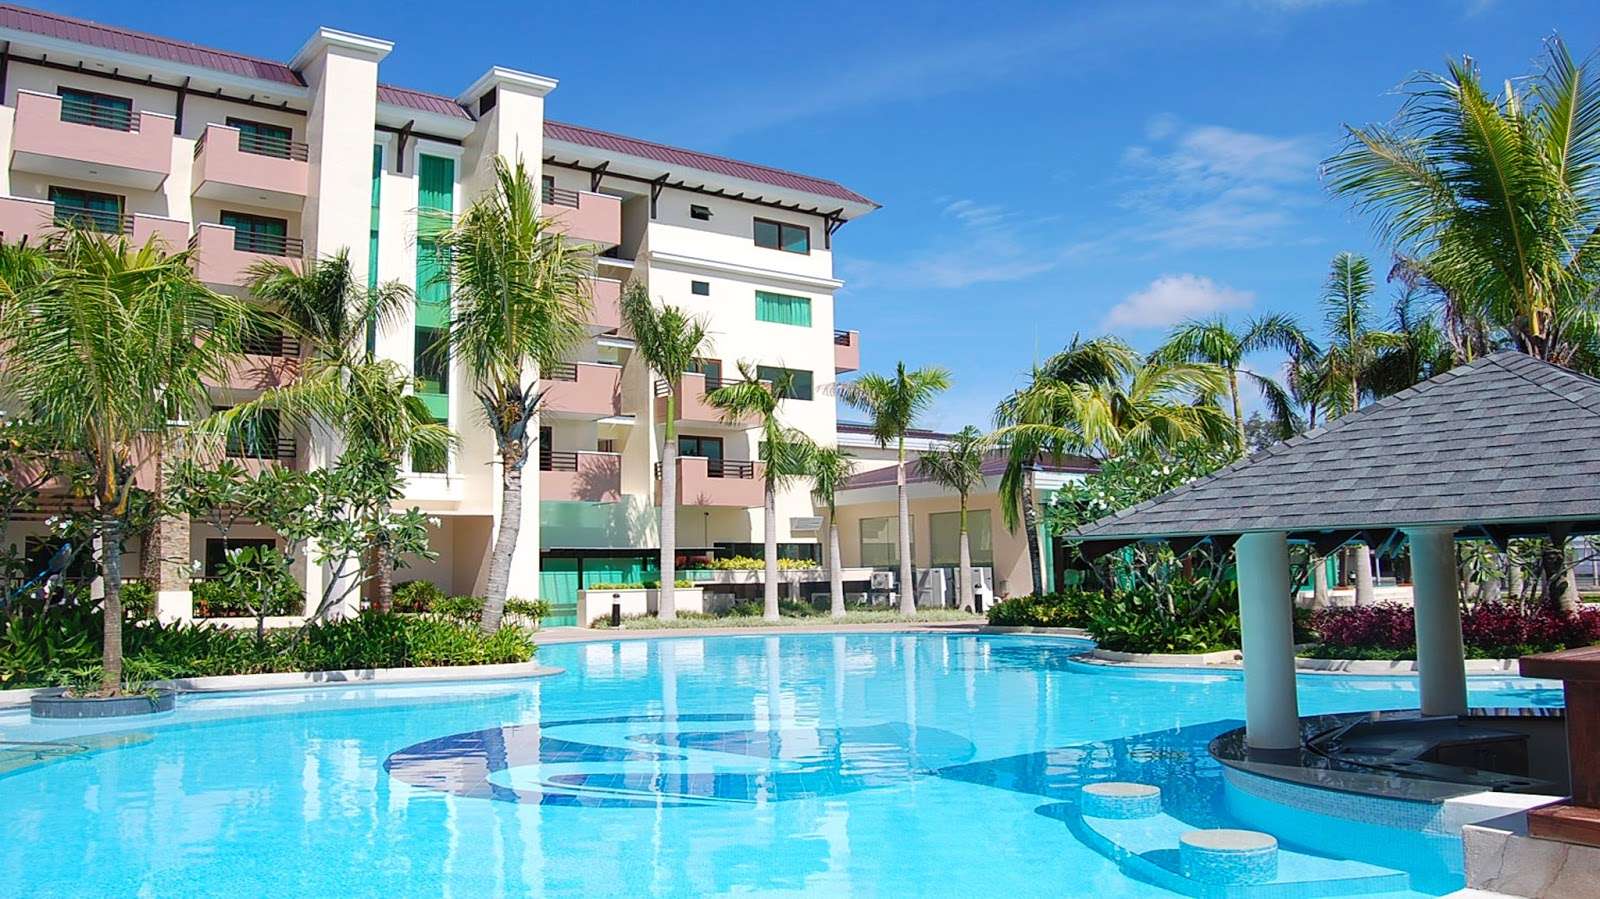 Hotel Reservations  Book Hotel Rooms Online  Hyatt